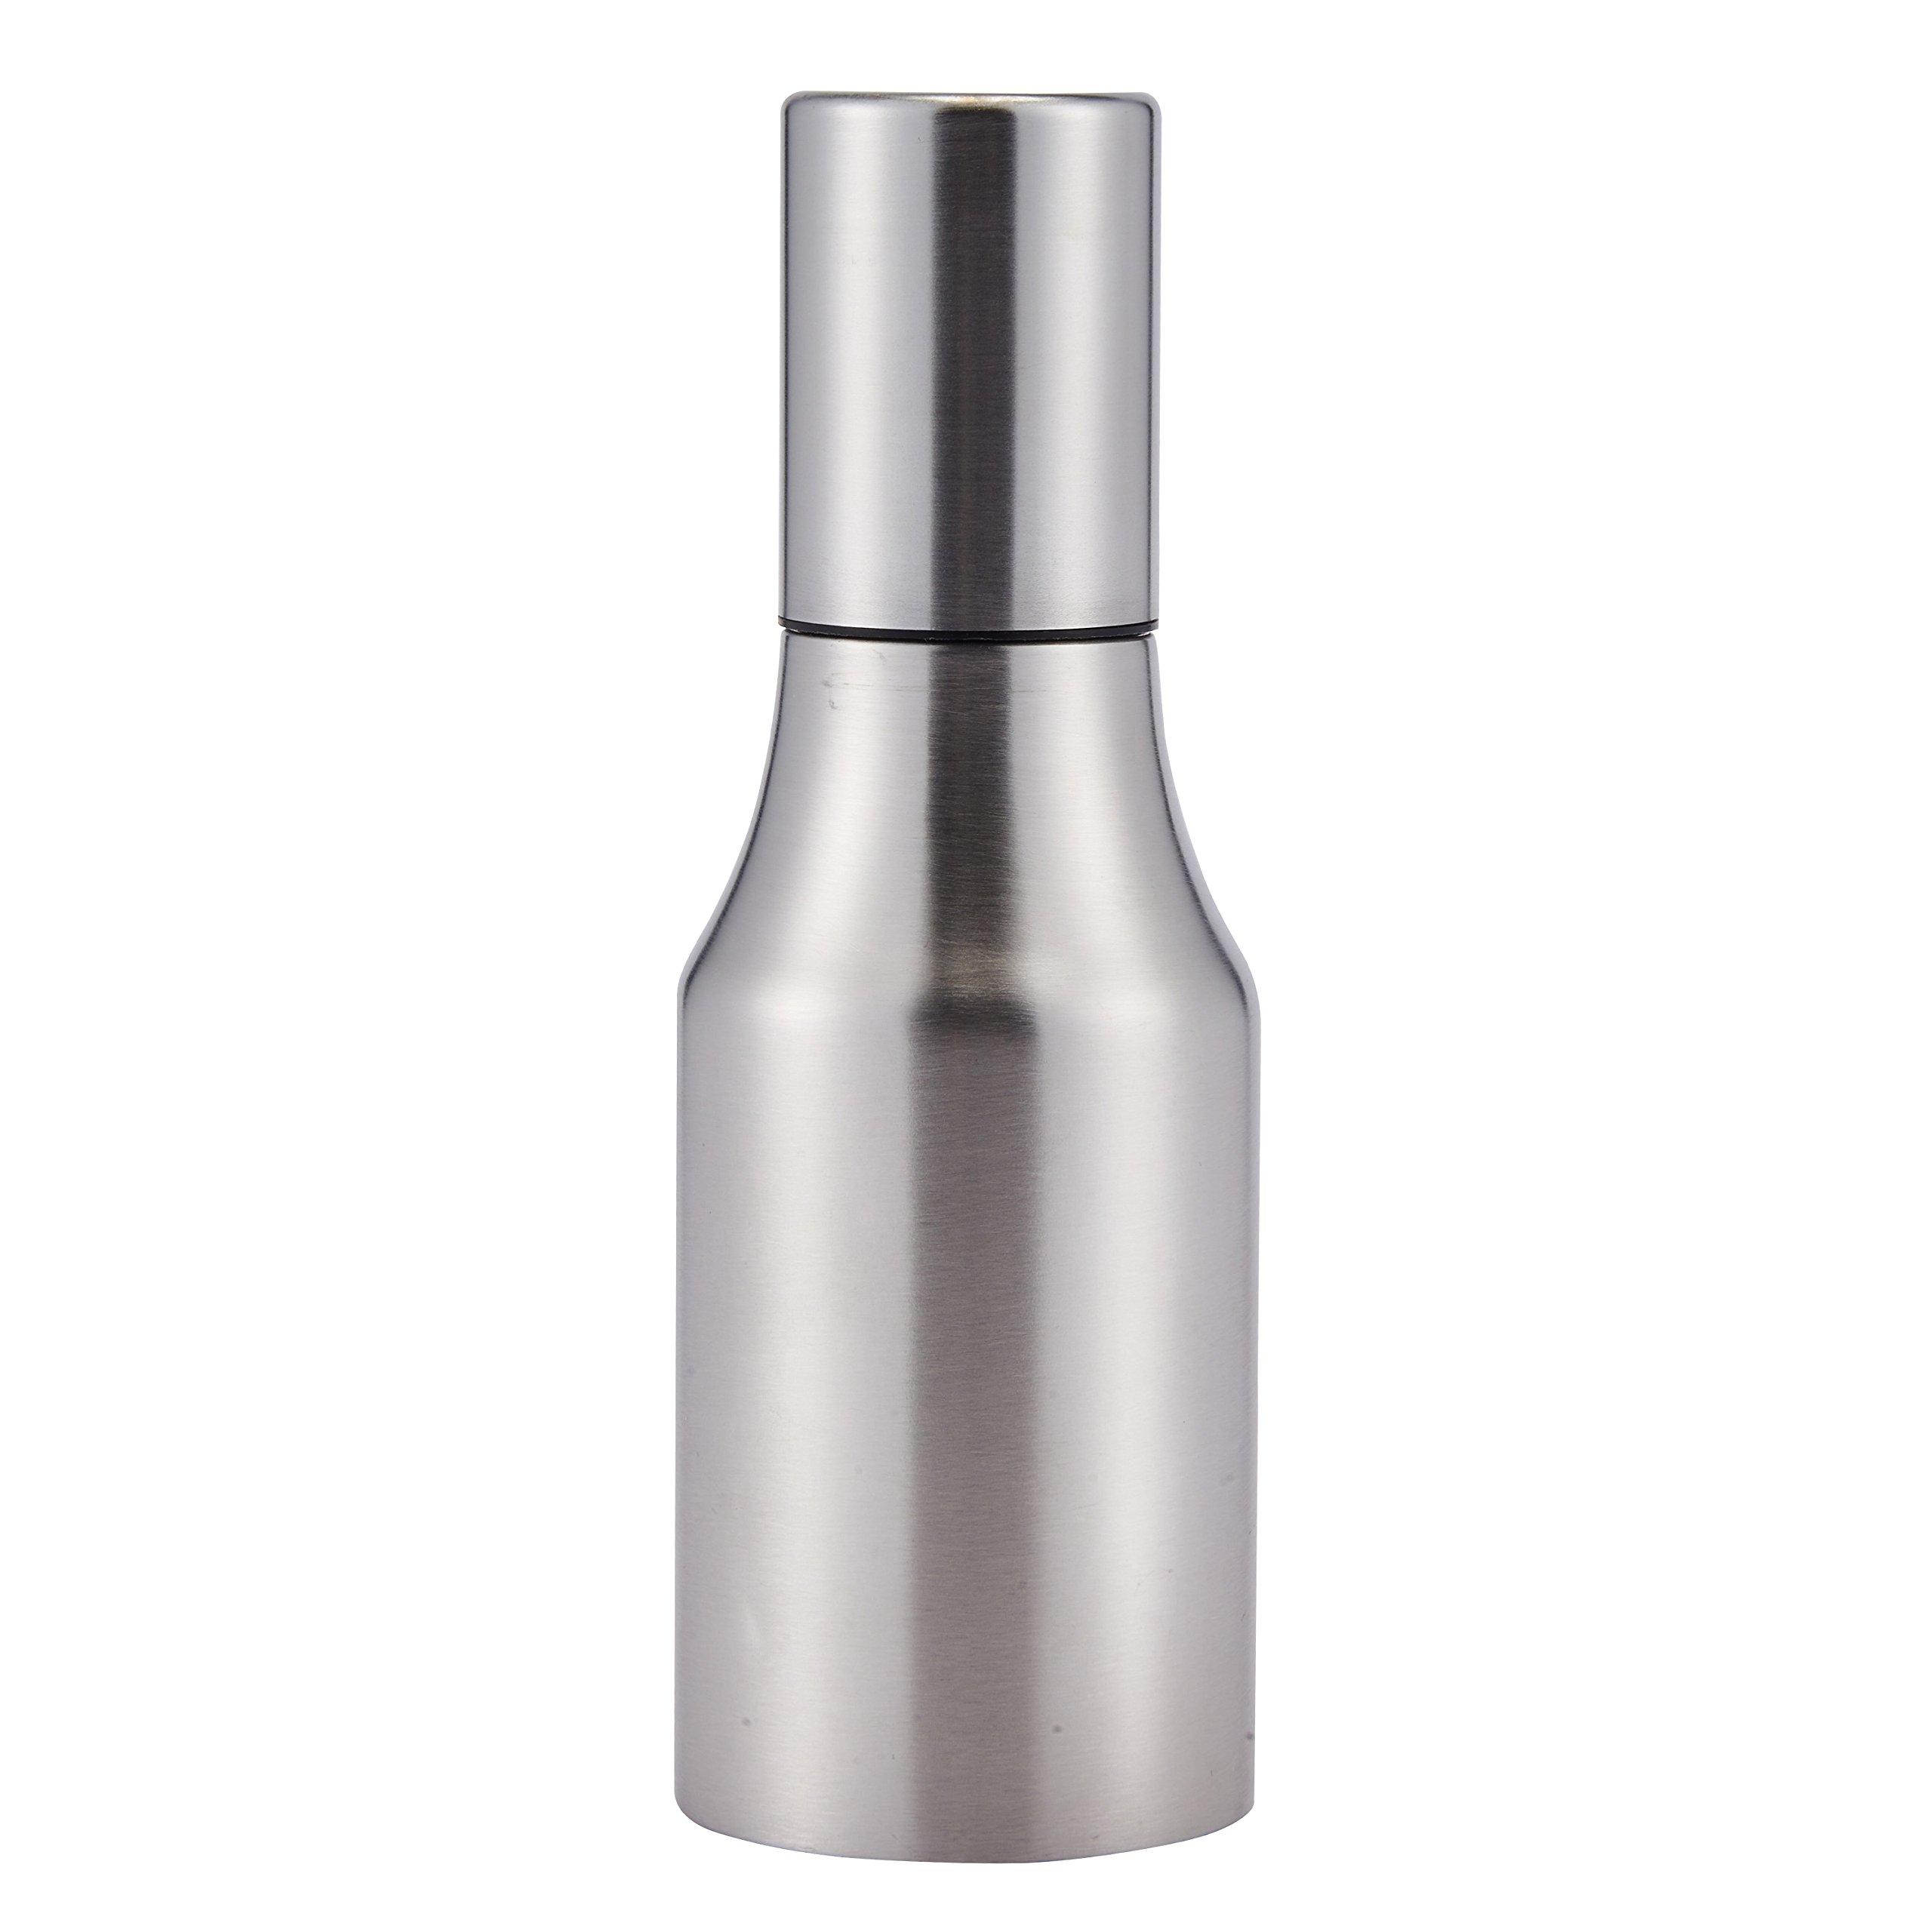 Stainless Steel Olive Oil Vinegar Dispenser Leak-proof Sauce Cruet Edible Oil Bottle Container Pot with Precise Pouring Spout 17oz/500ML